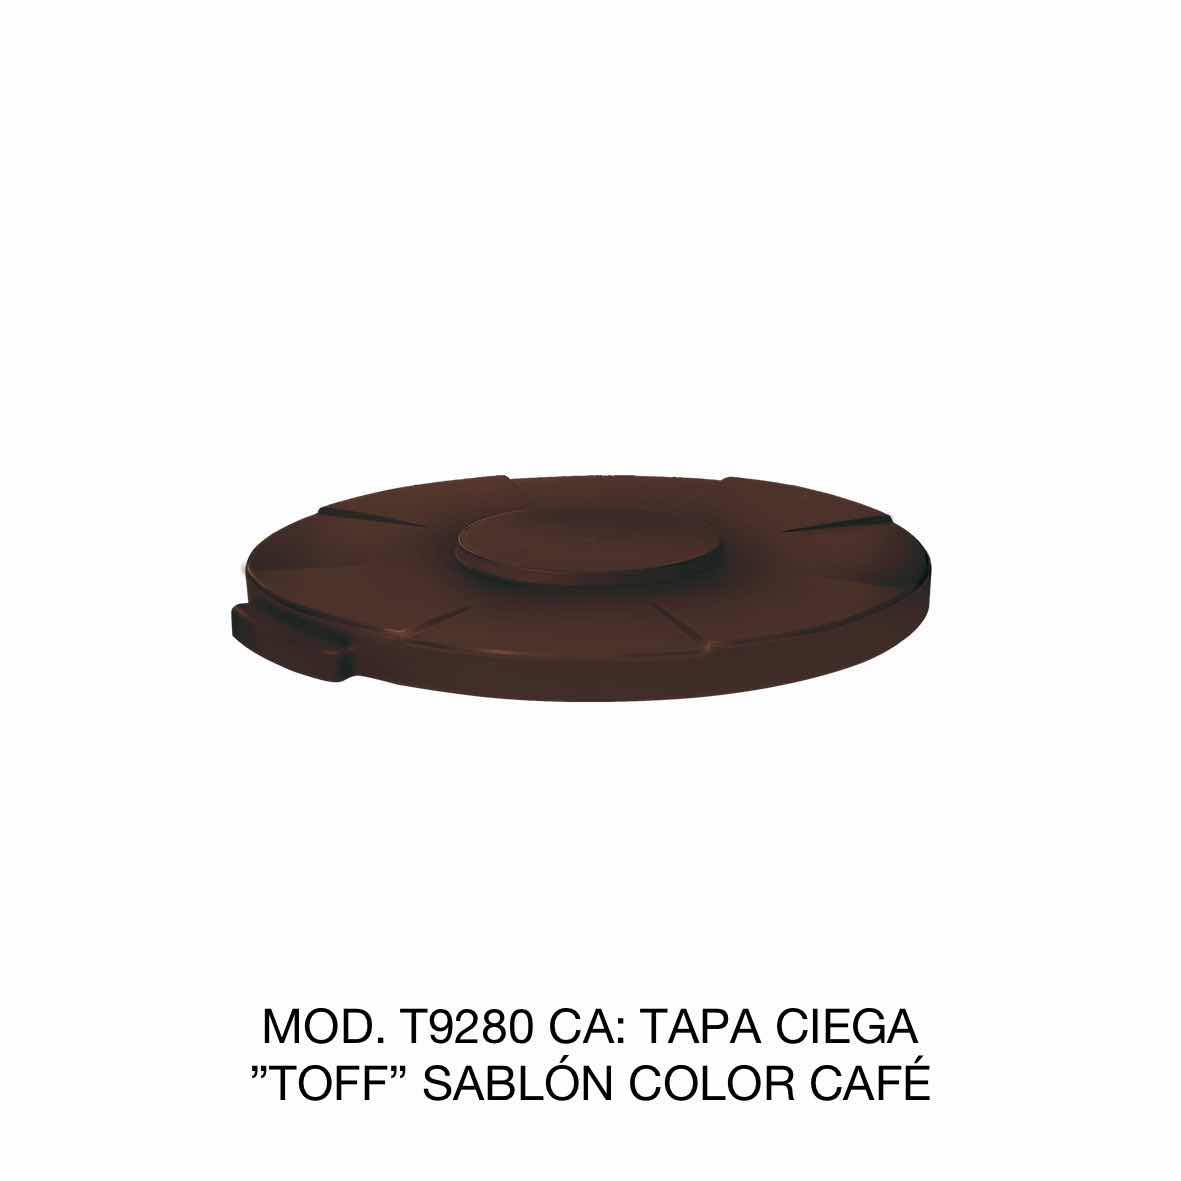 Tapa para contenedor de basura de 120 litros TOFF modelo T9280 CA color café de Sablón